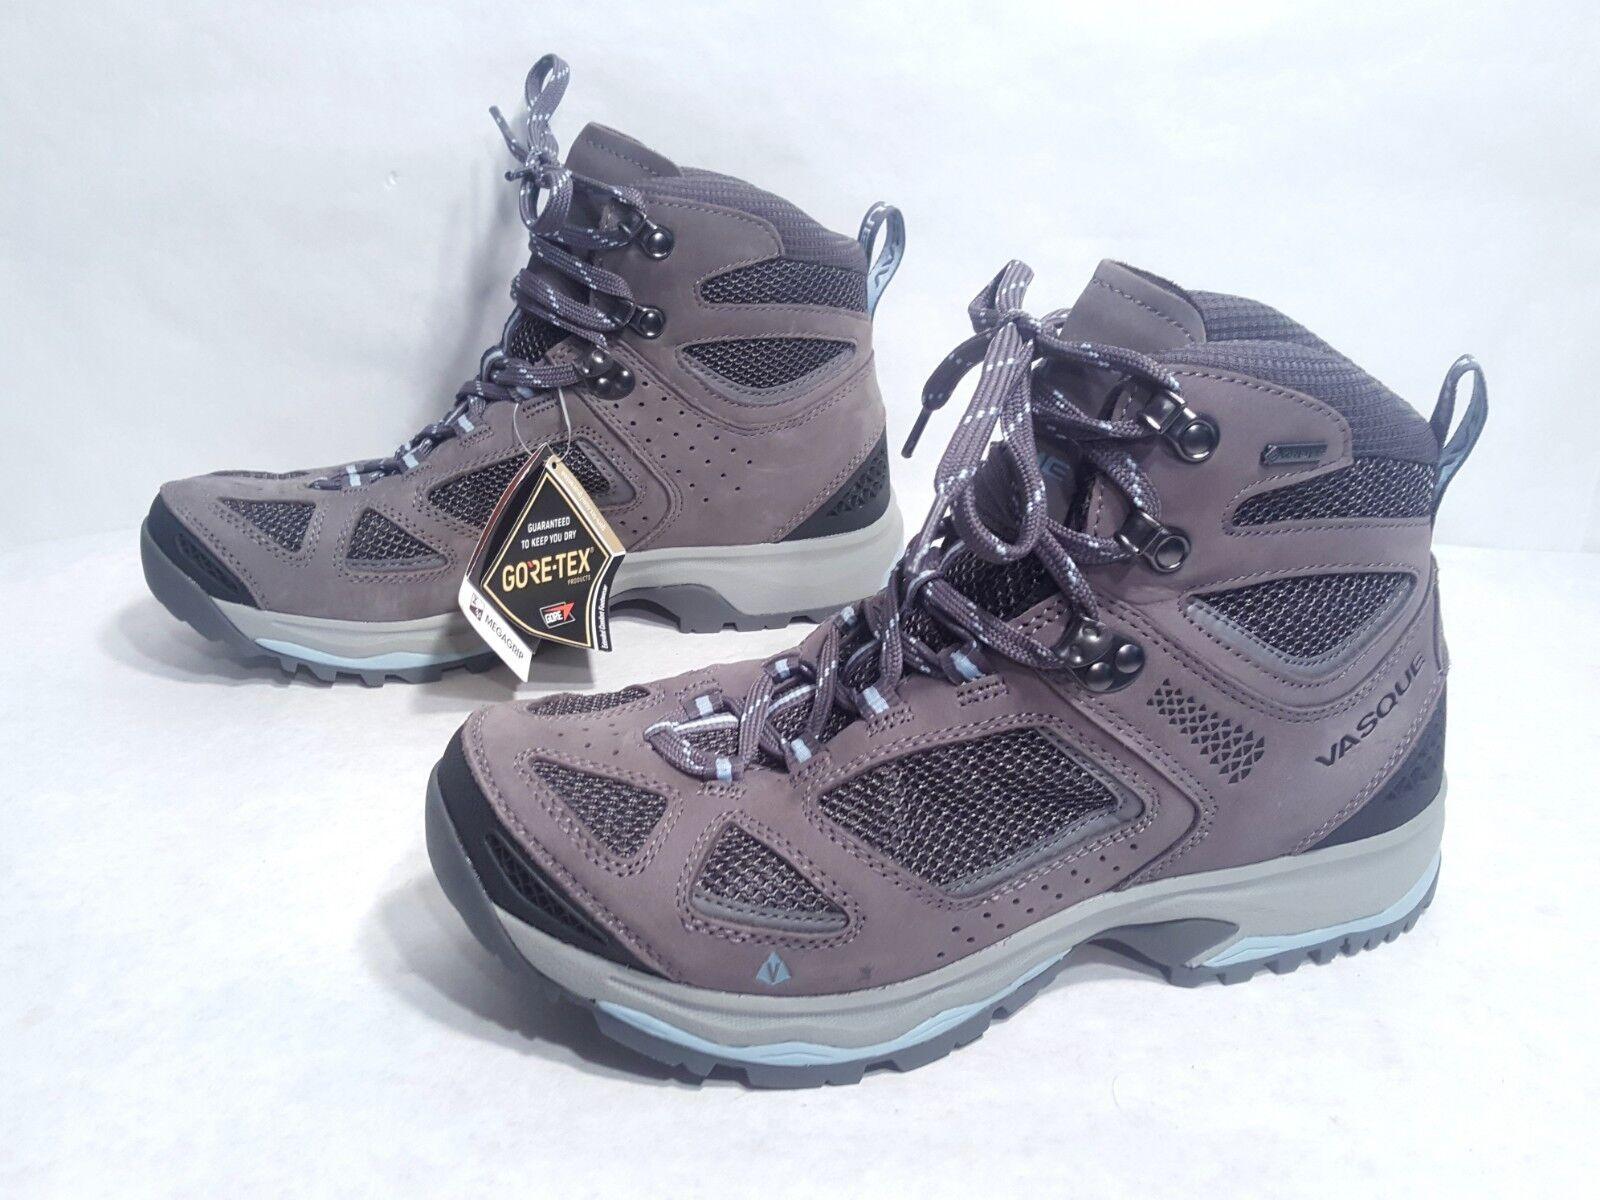 NWOB Mismatched Size Pair Vasque Breeze III GTX Hiking Boots Size L R 10W 10.5M